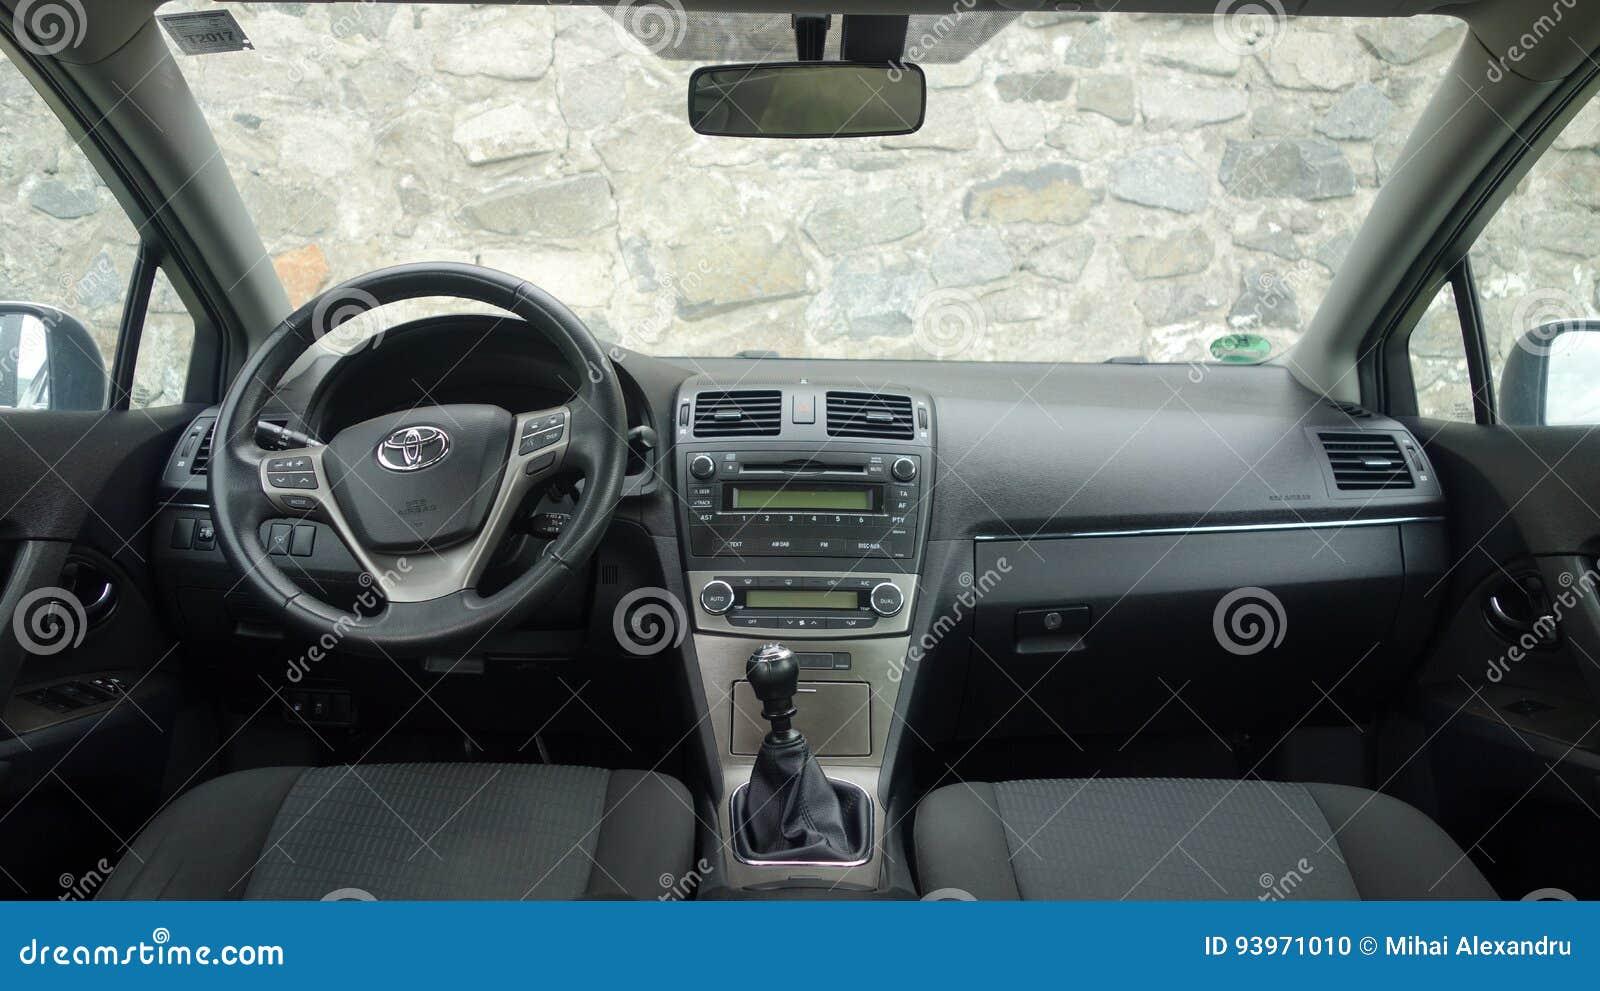 Klausenburg Napoca/Rumänien - 9. Mai 2017: Jahr 2010, volle Wahlausrüstung, Fotosession, Armaturenbrettcockpit Toyotas Avensis-